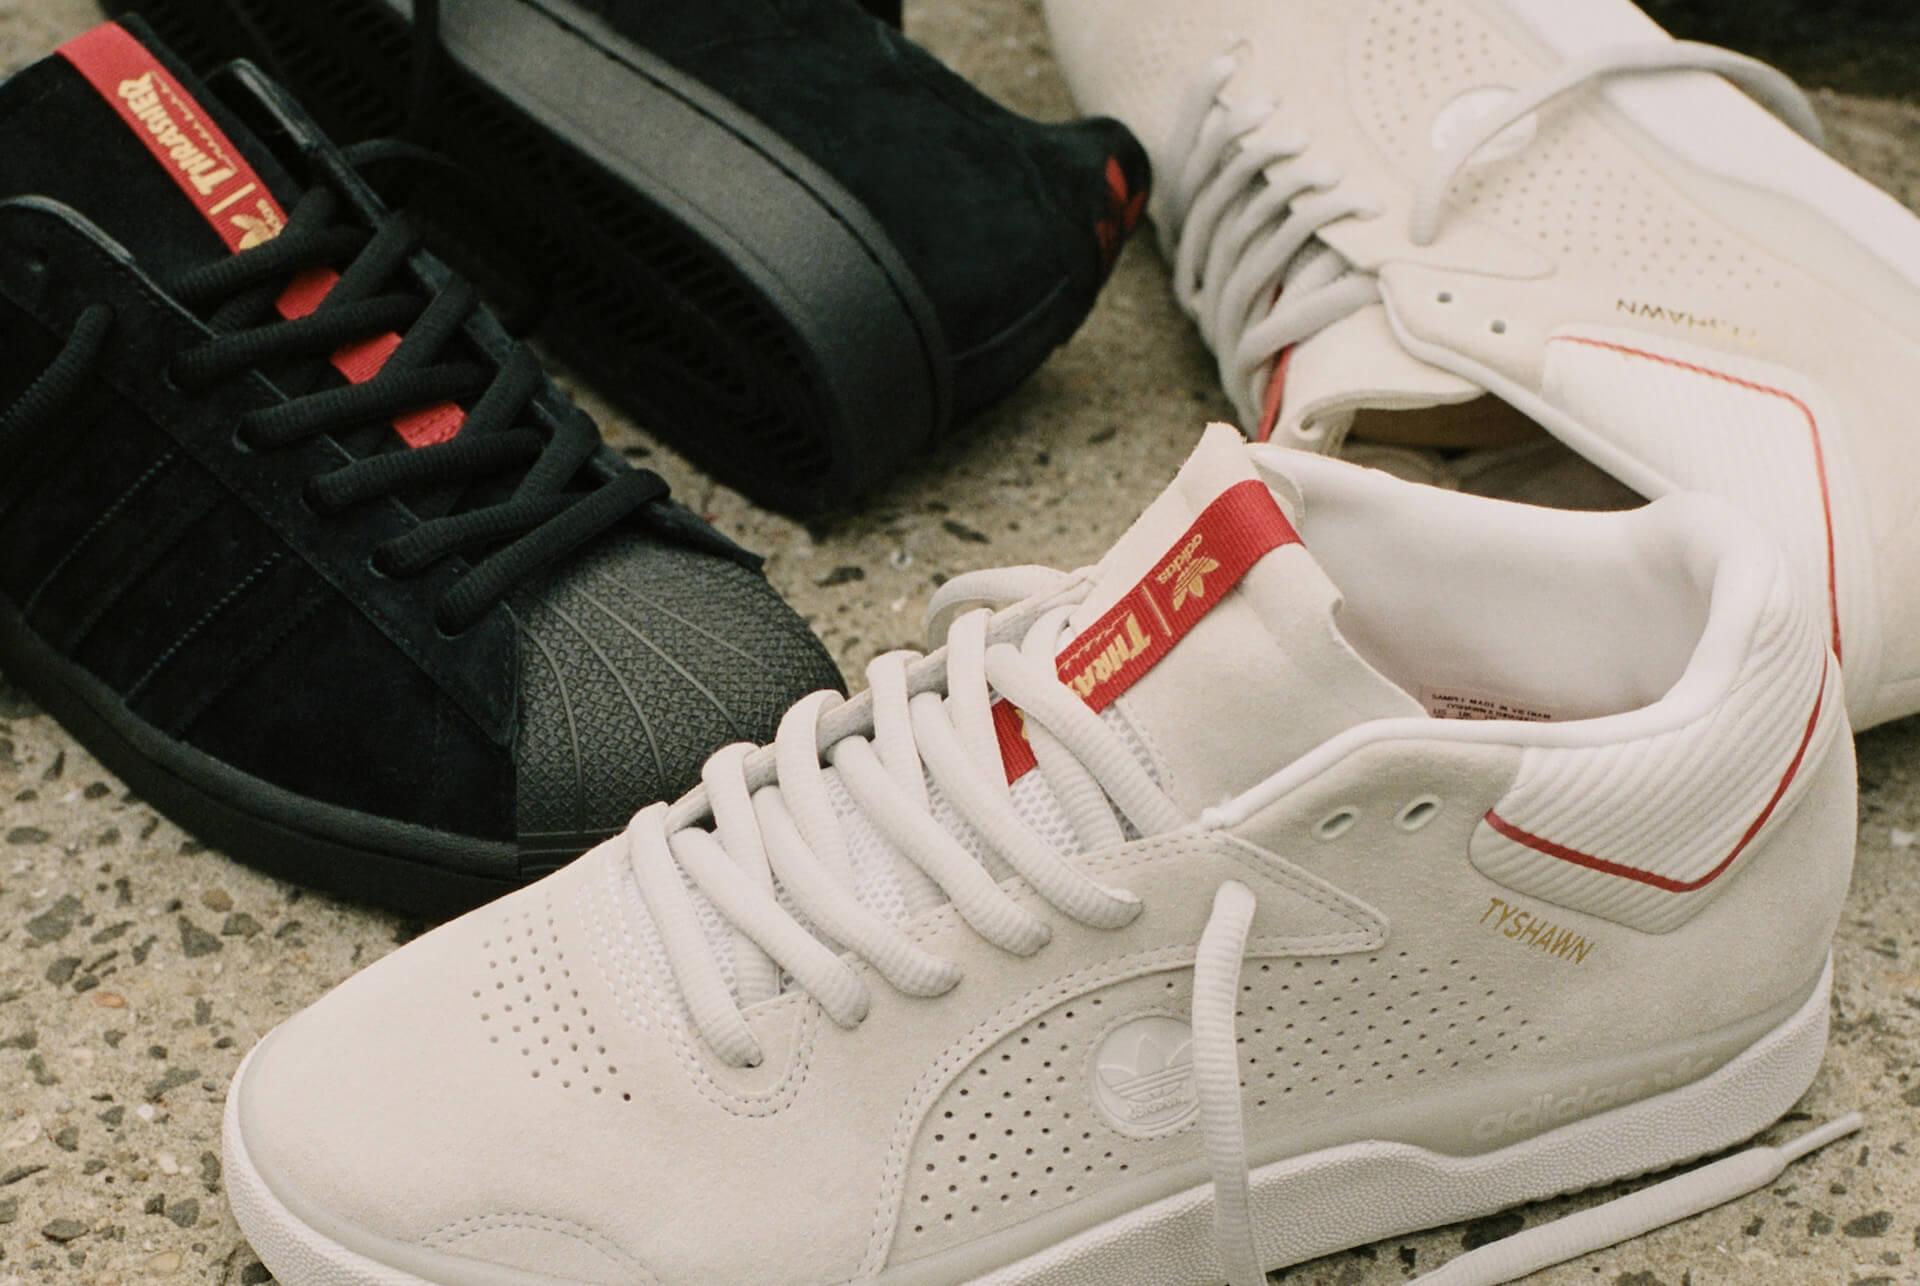 adidas SkateboardingとTHRASHERがコラボ!プロスケーターTyshawn Jonesのシグネチャーモデル&新型SUPERSTARが登場 life201126_adidas_skateboarding_21